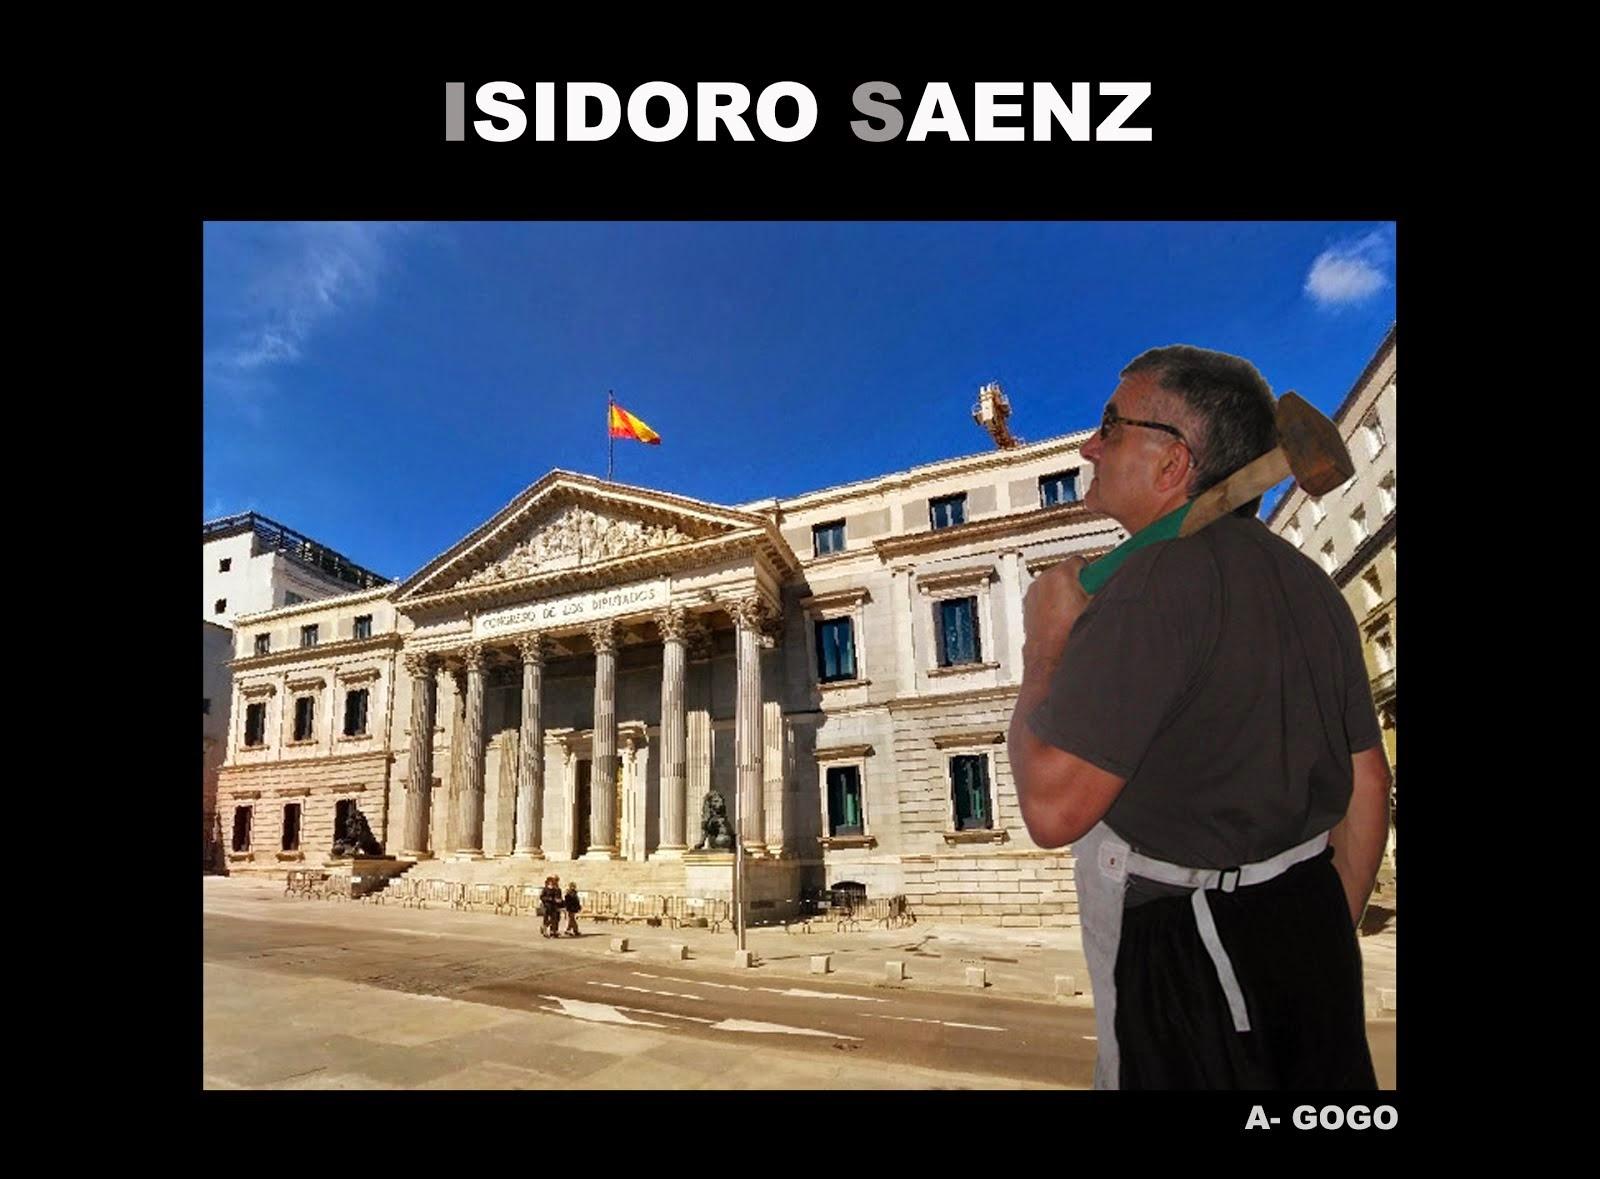 ISIDORO SAENZ